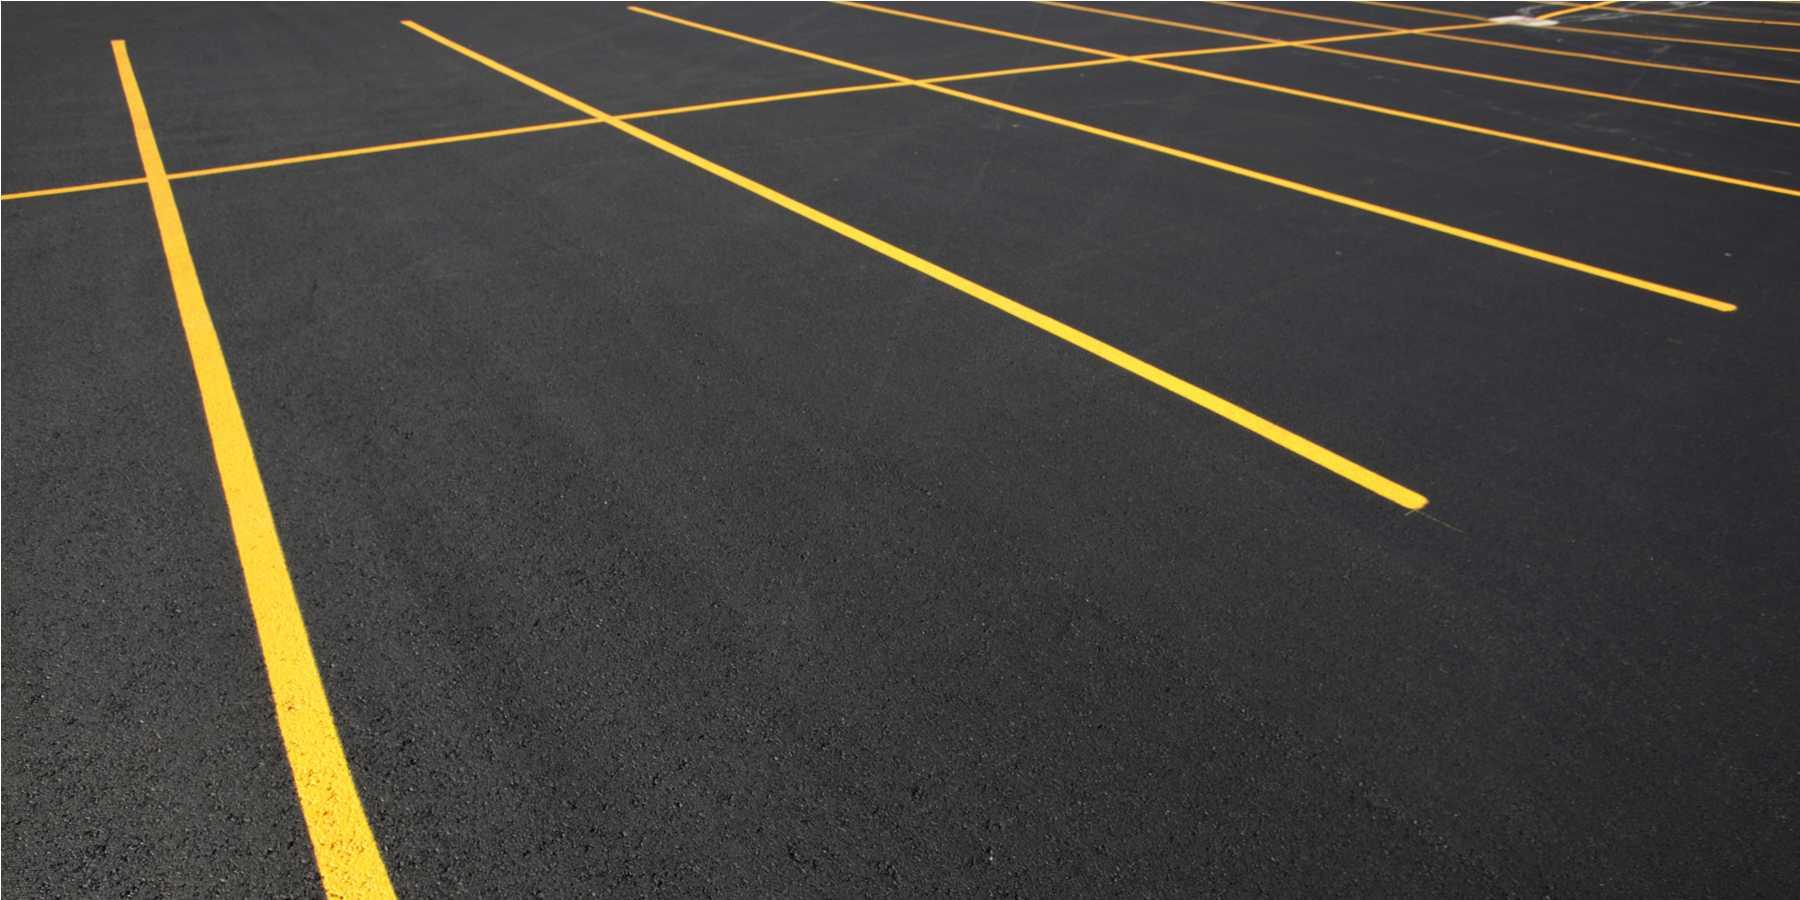 Ru:highway classification